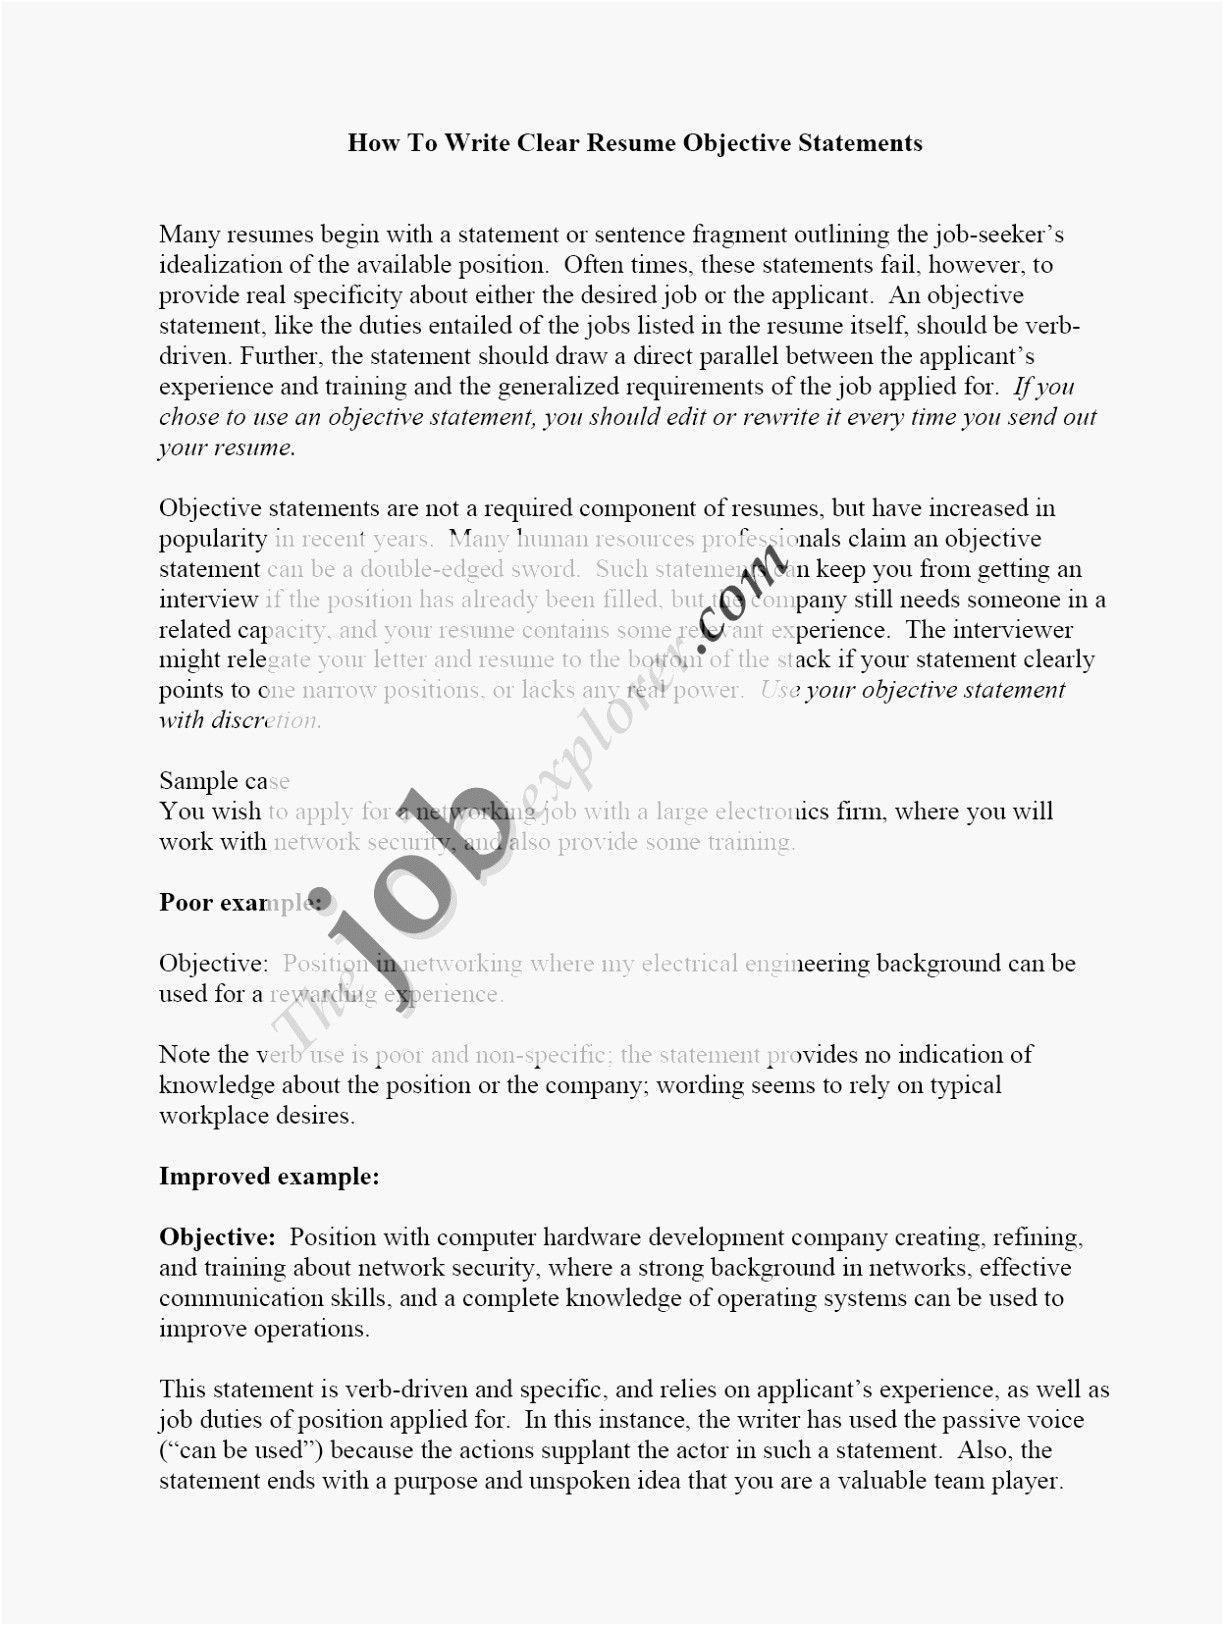 Business purpose statement examples examplesofgoals